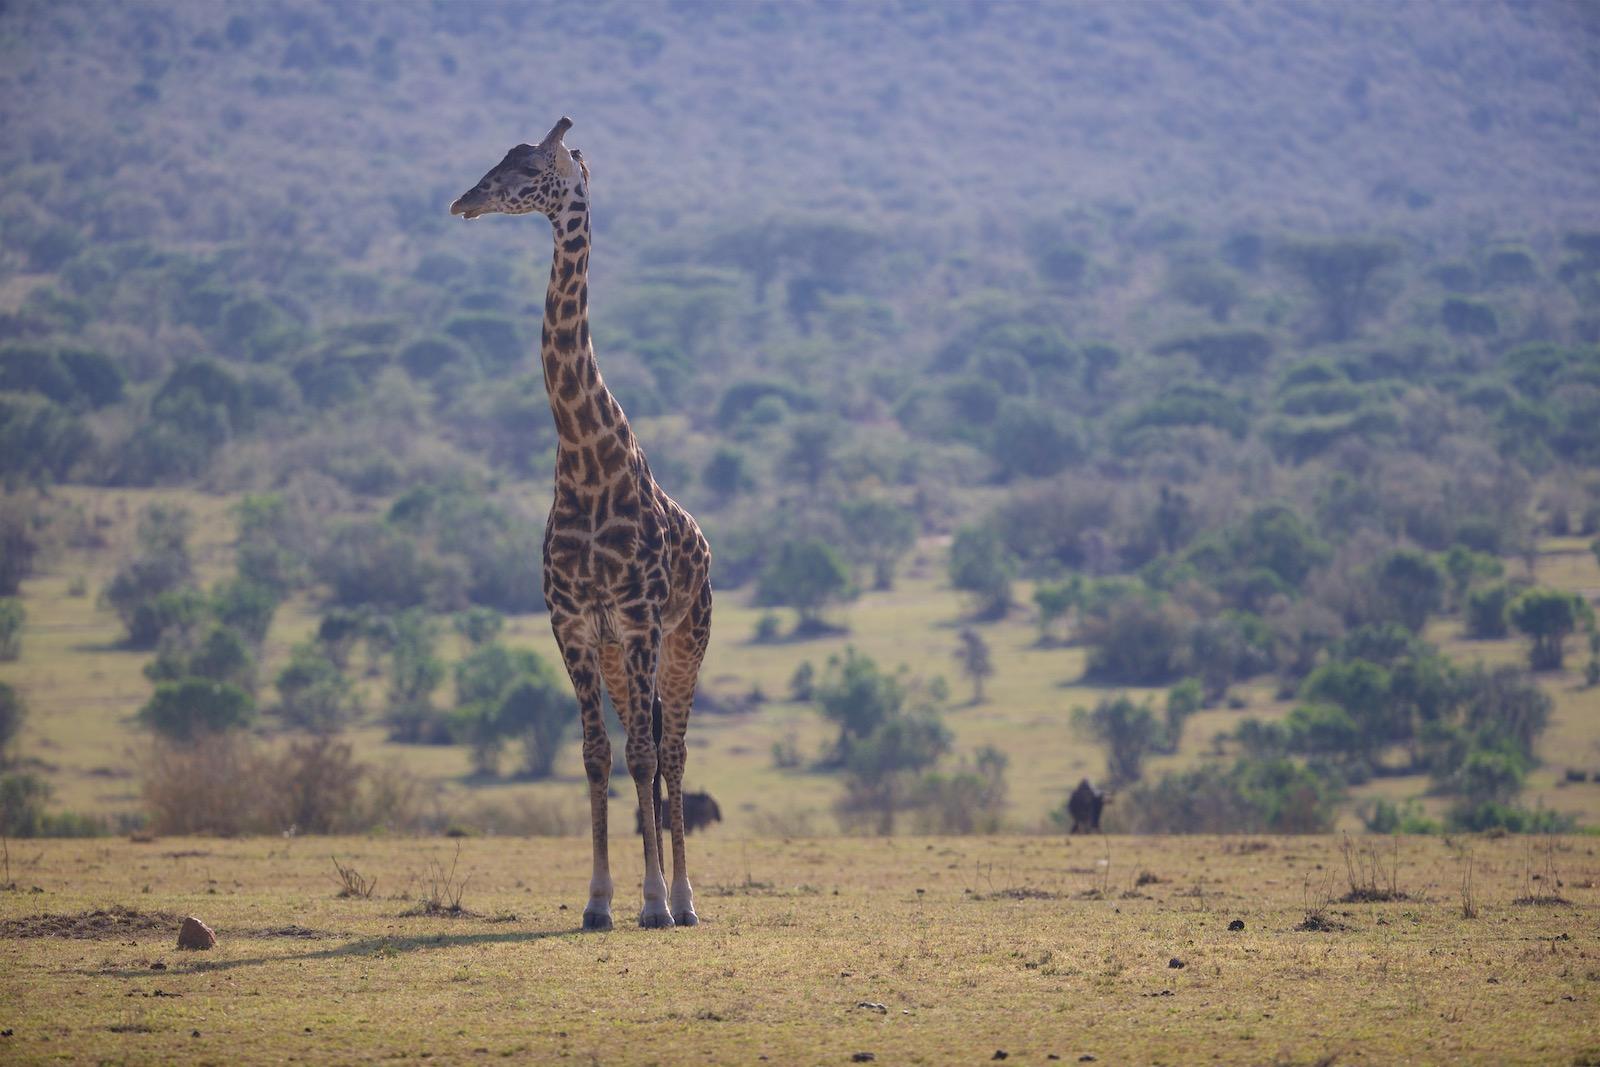 Giraf safari i Afrika